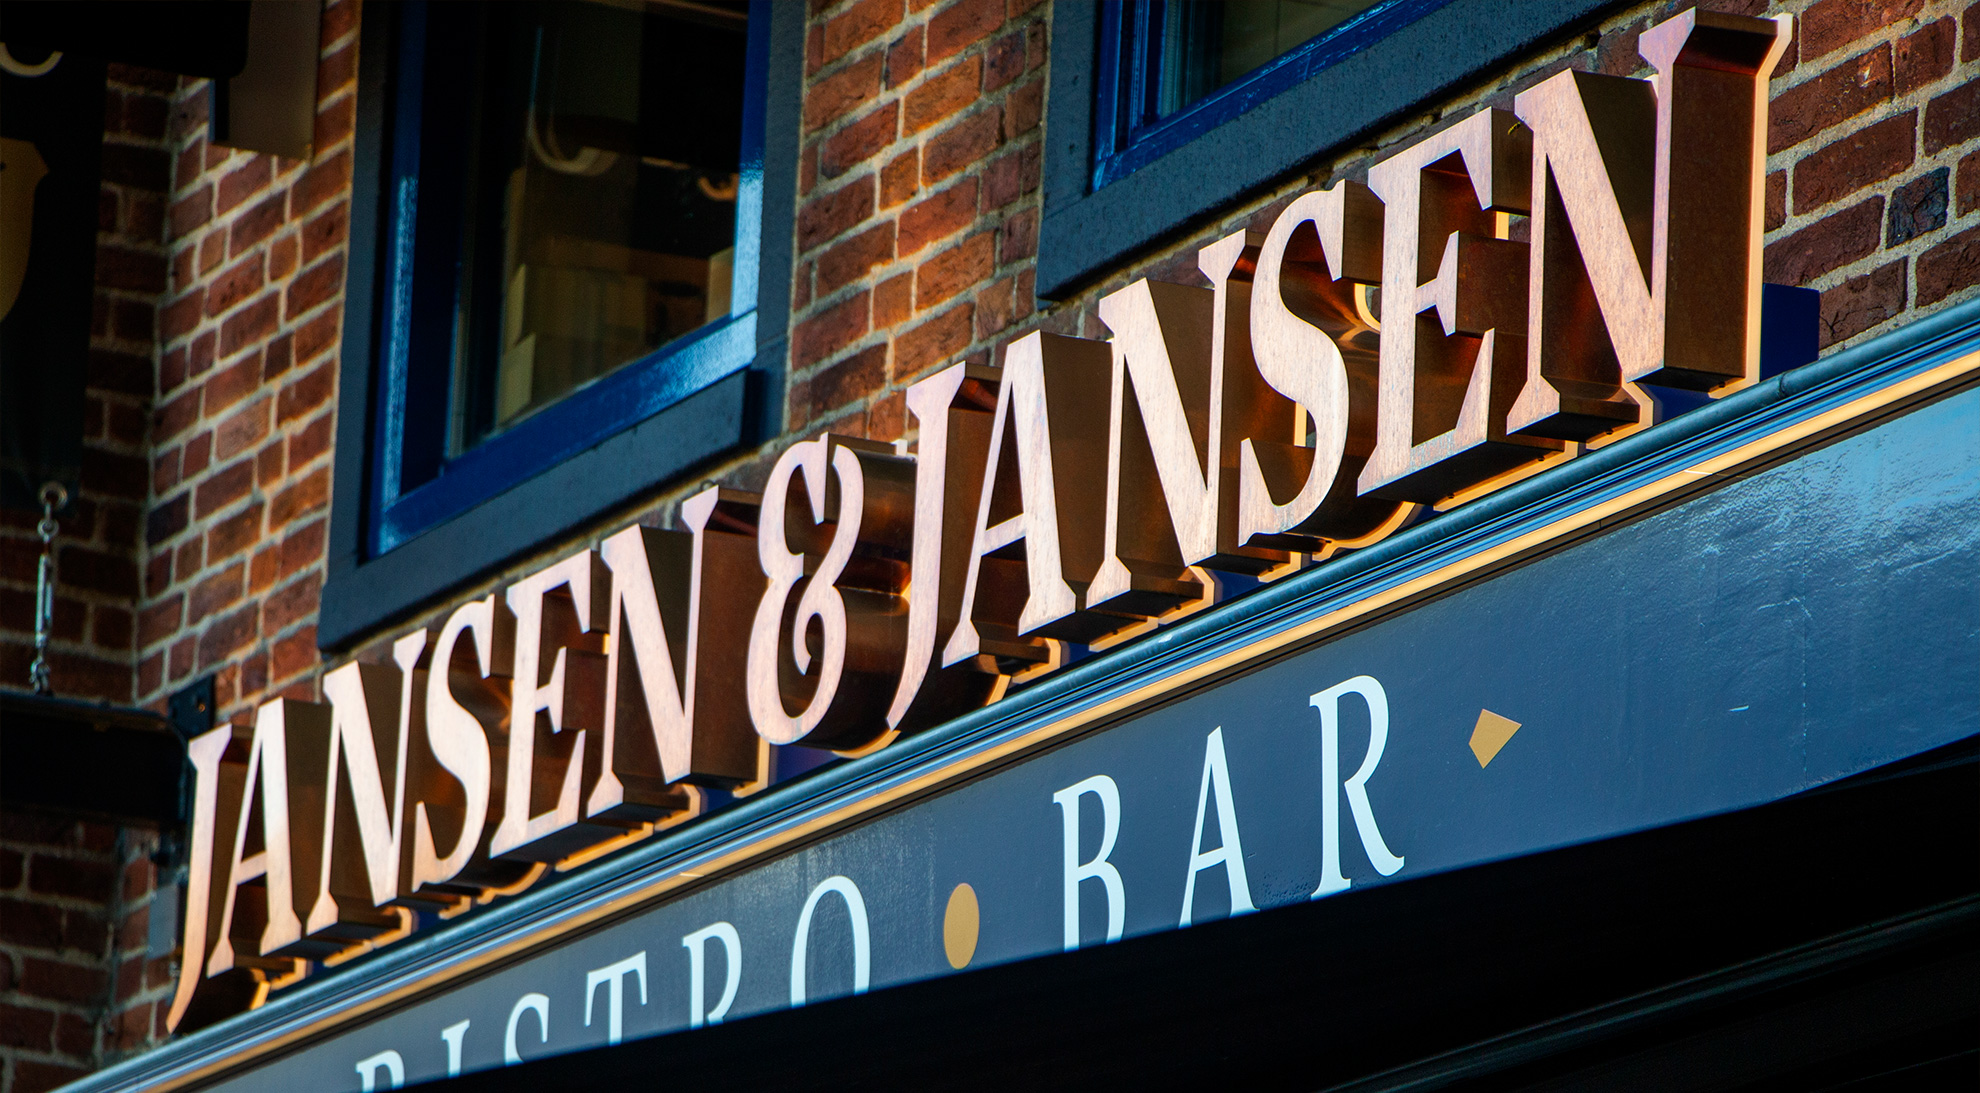 Jansen & Jansen branding